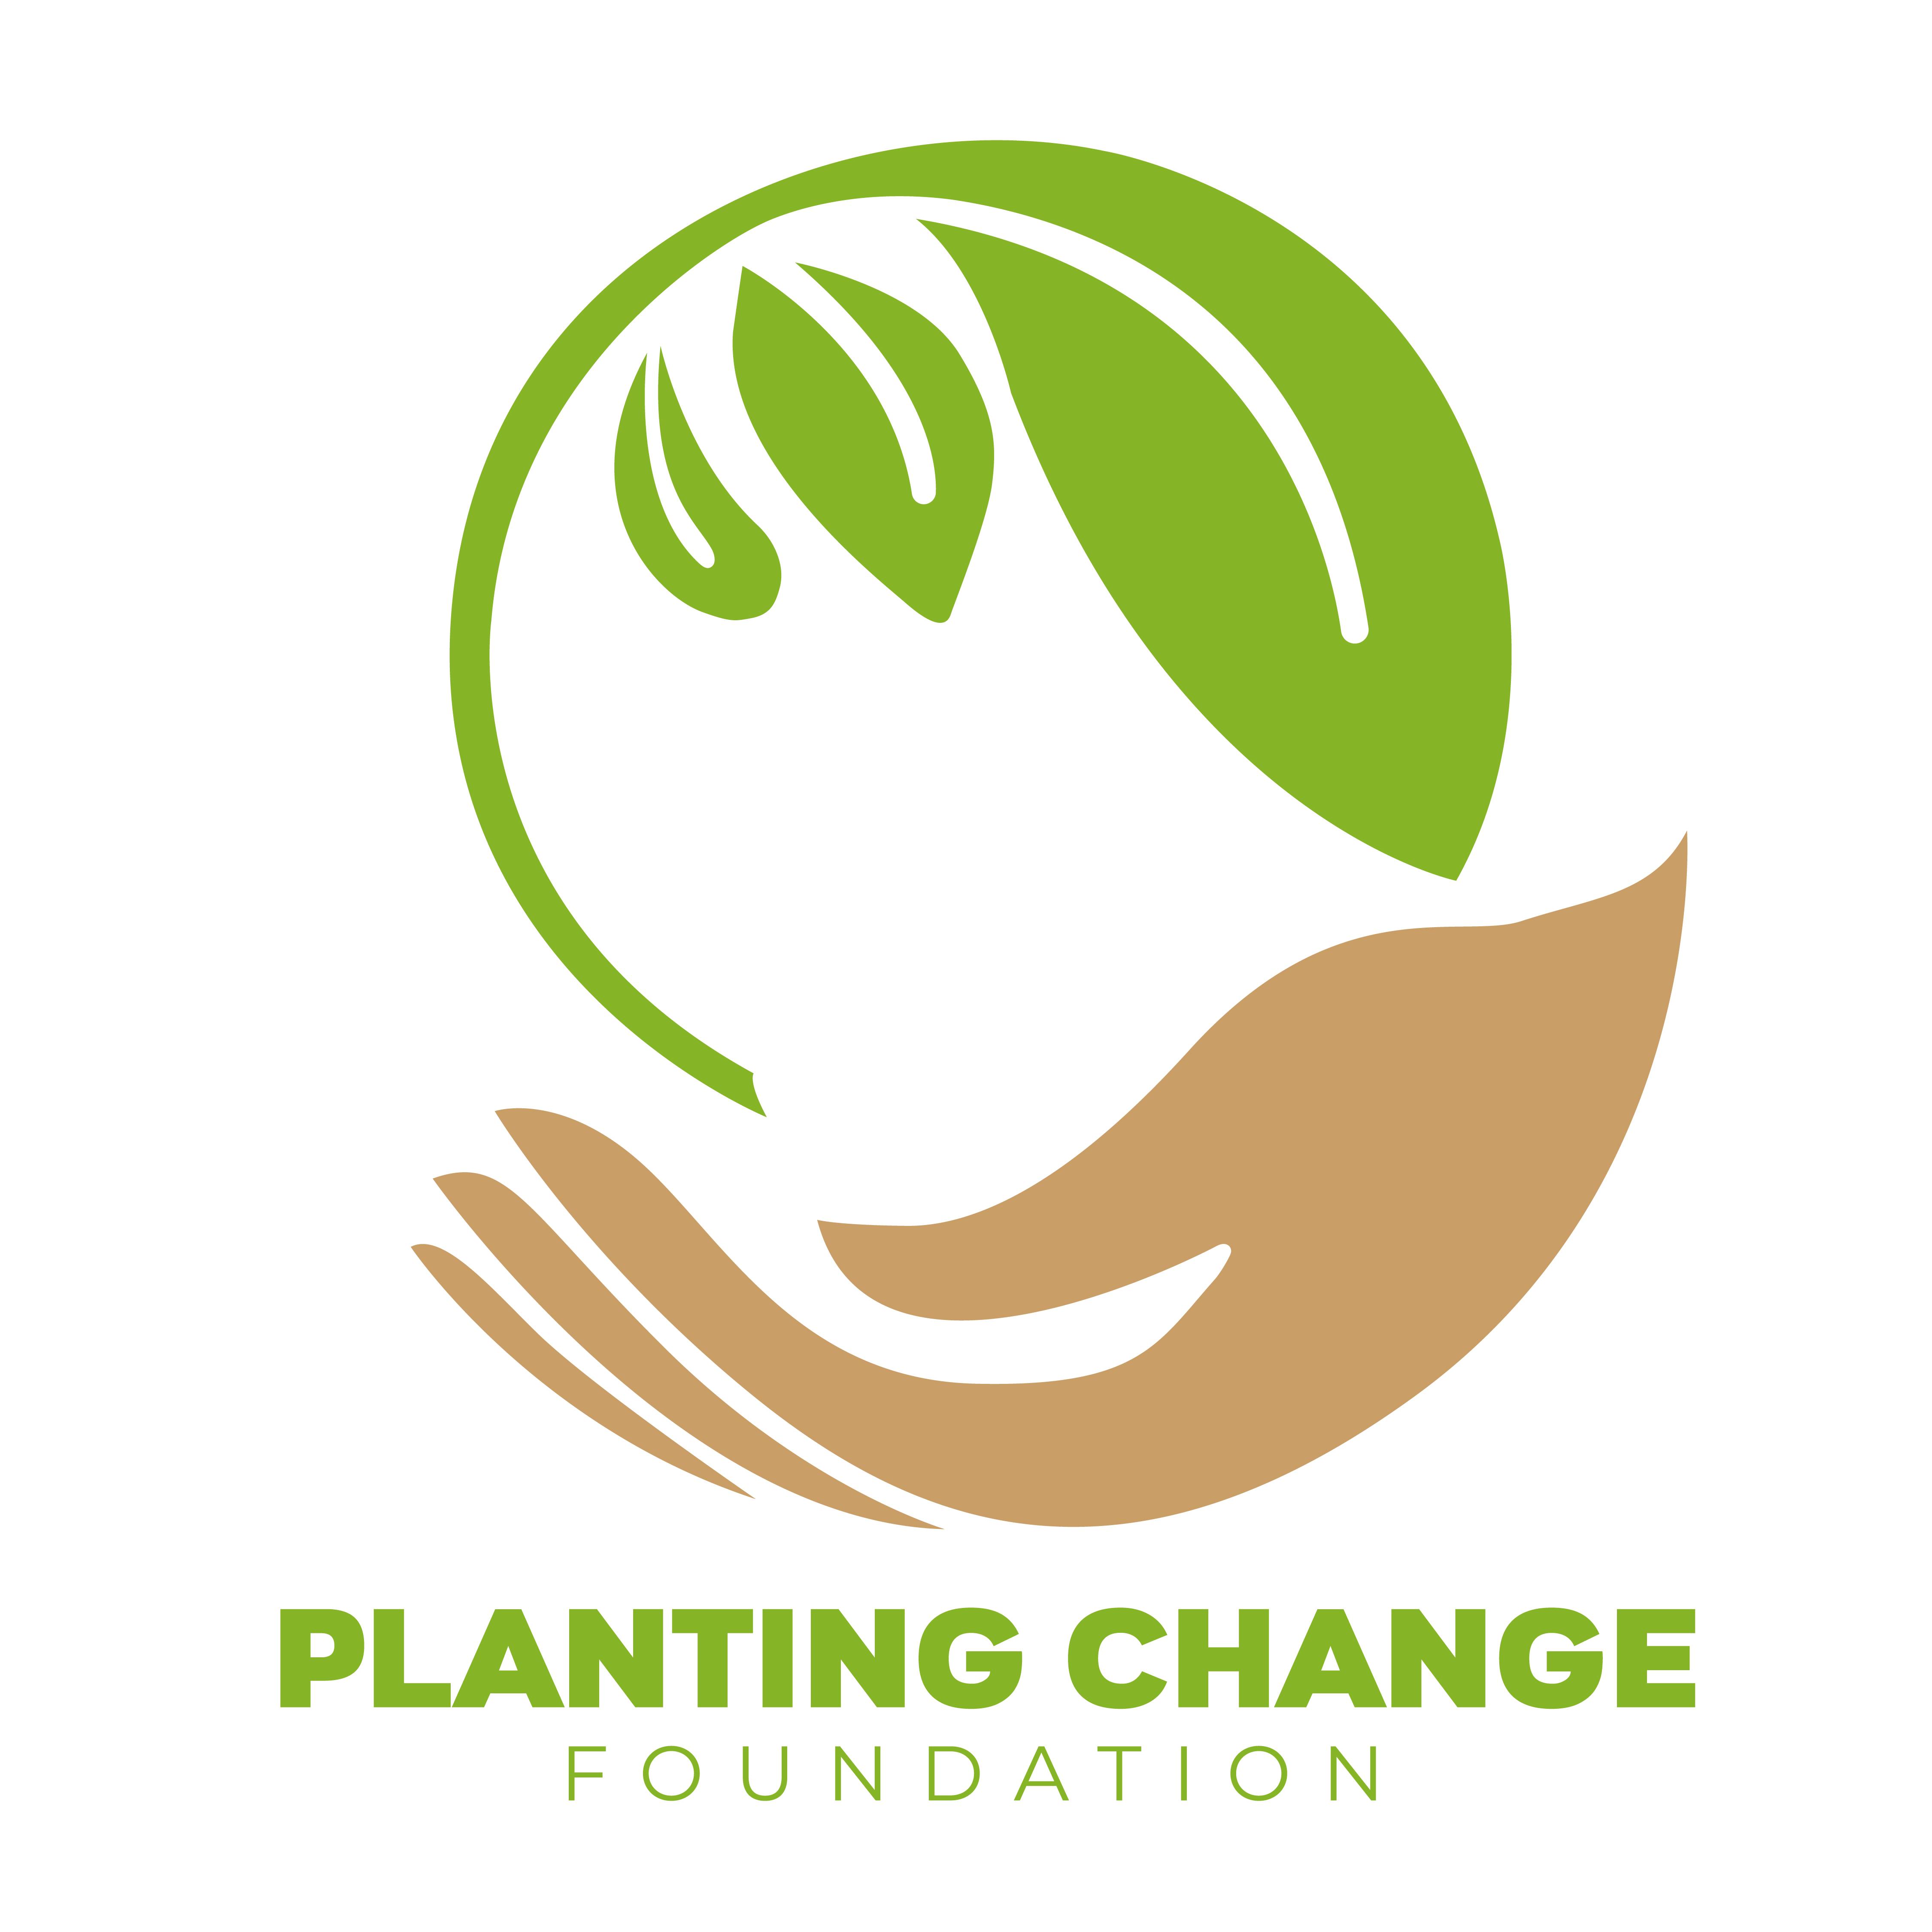 Planting Change Foundation